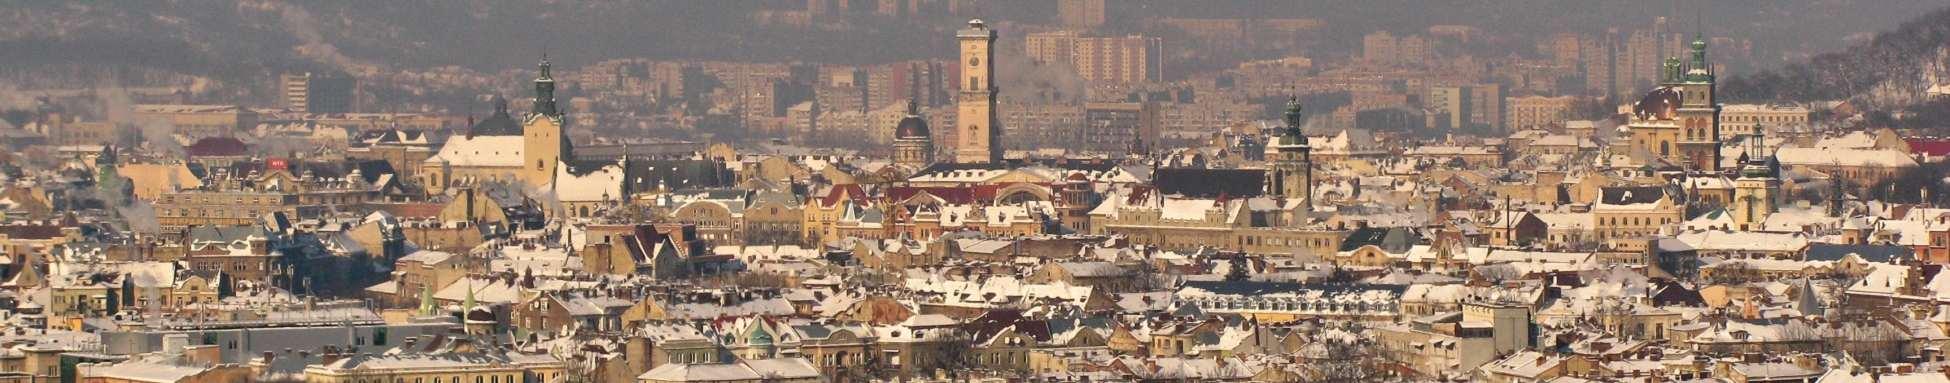 Панорама_Львова